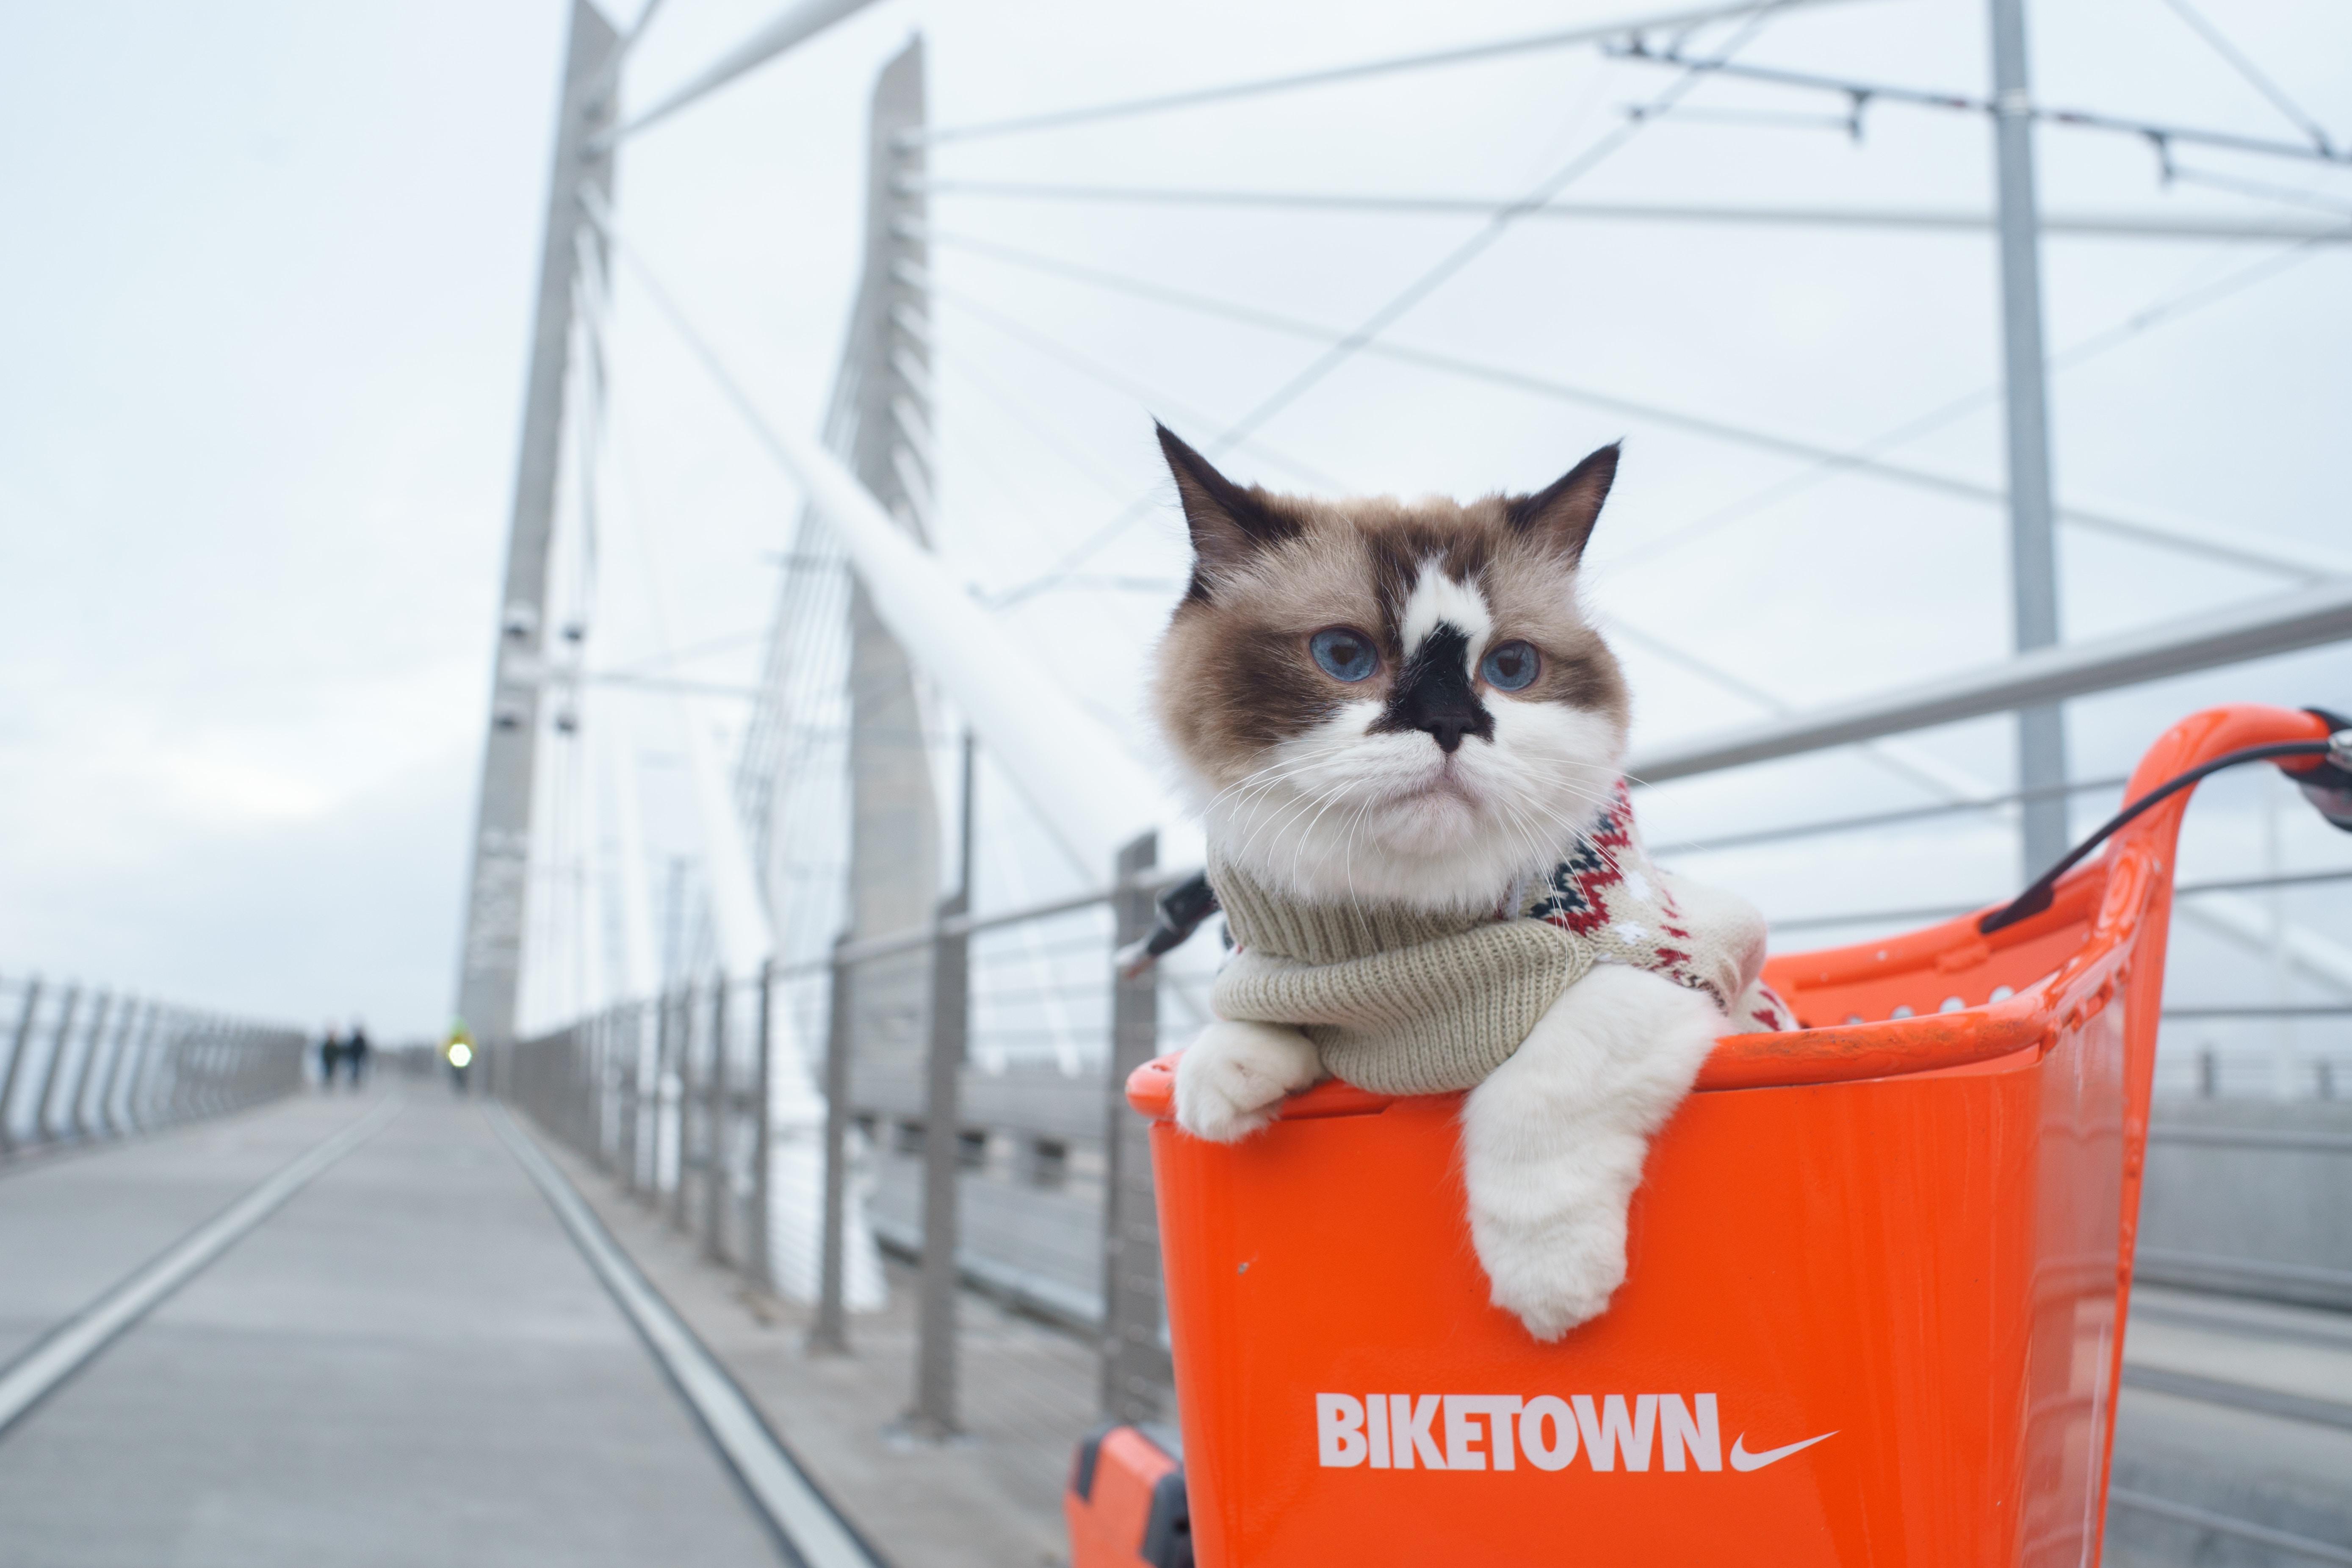 A cat in a Biketown bike basket while crossing a Portland bridge